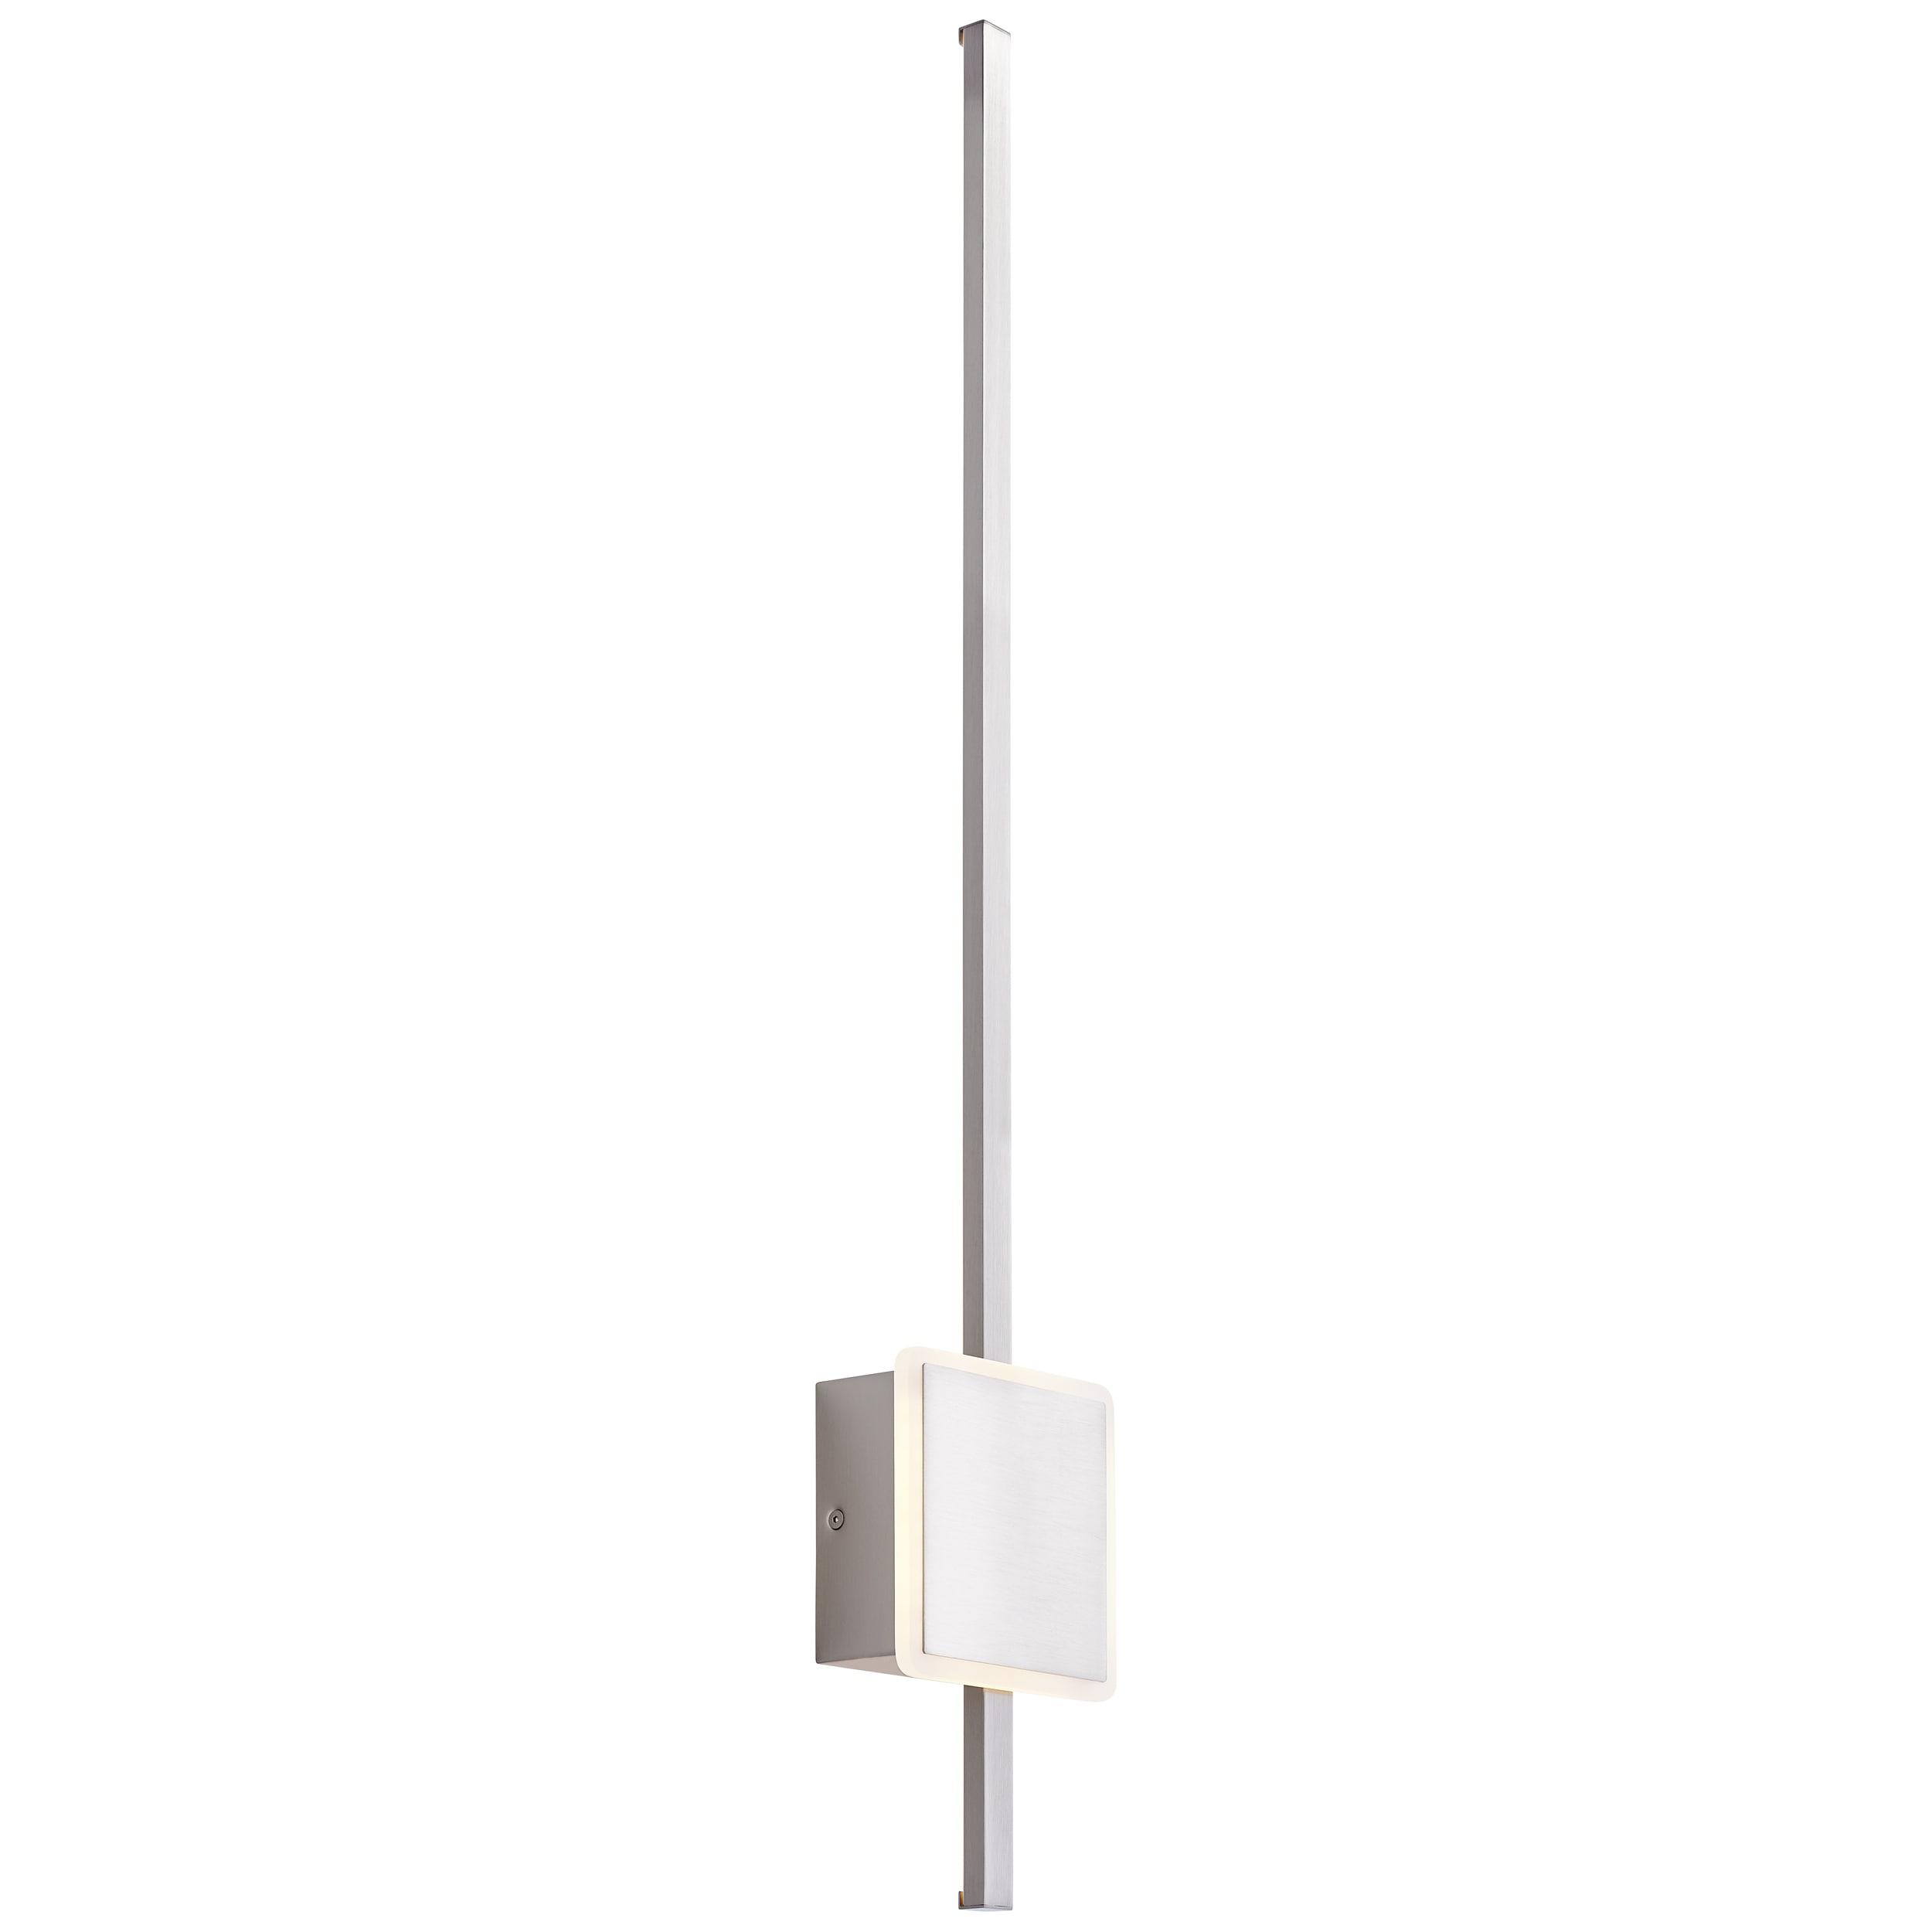 AEG Inessa LED Wandleuchte 82cm pearl nickel